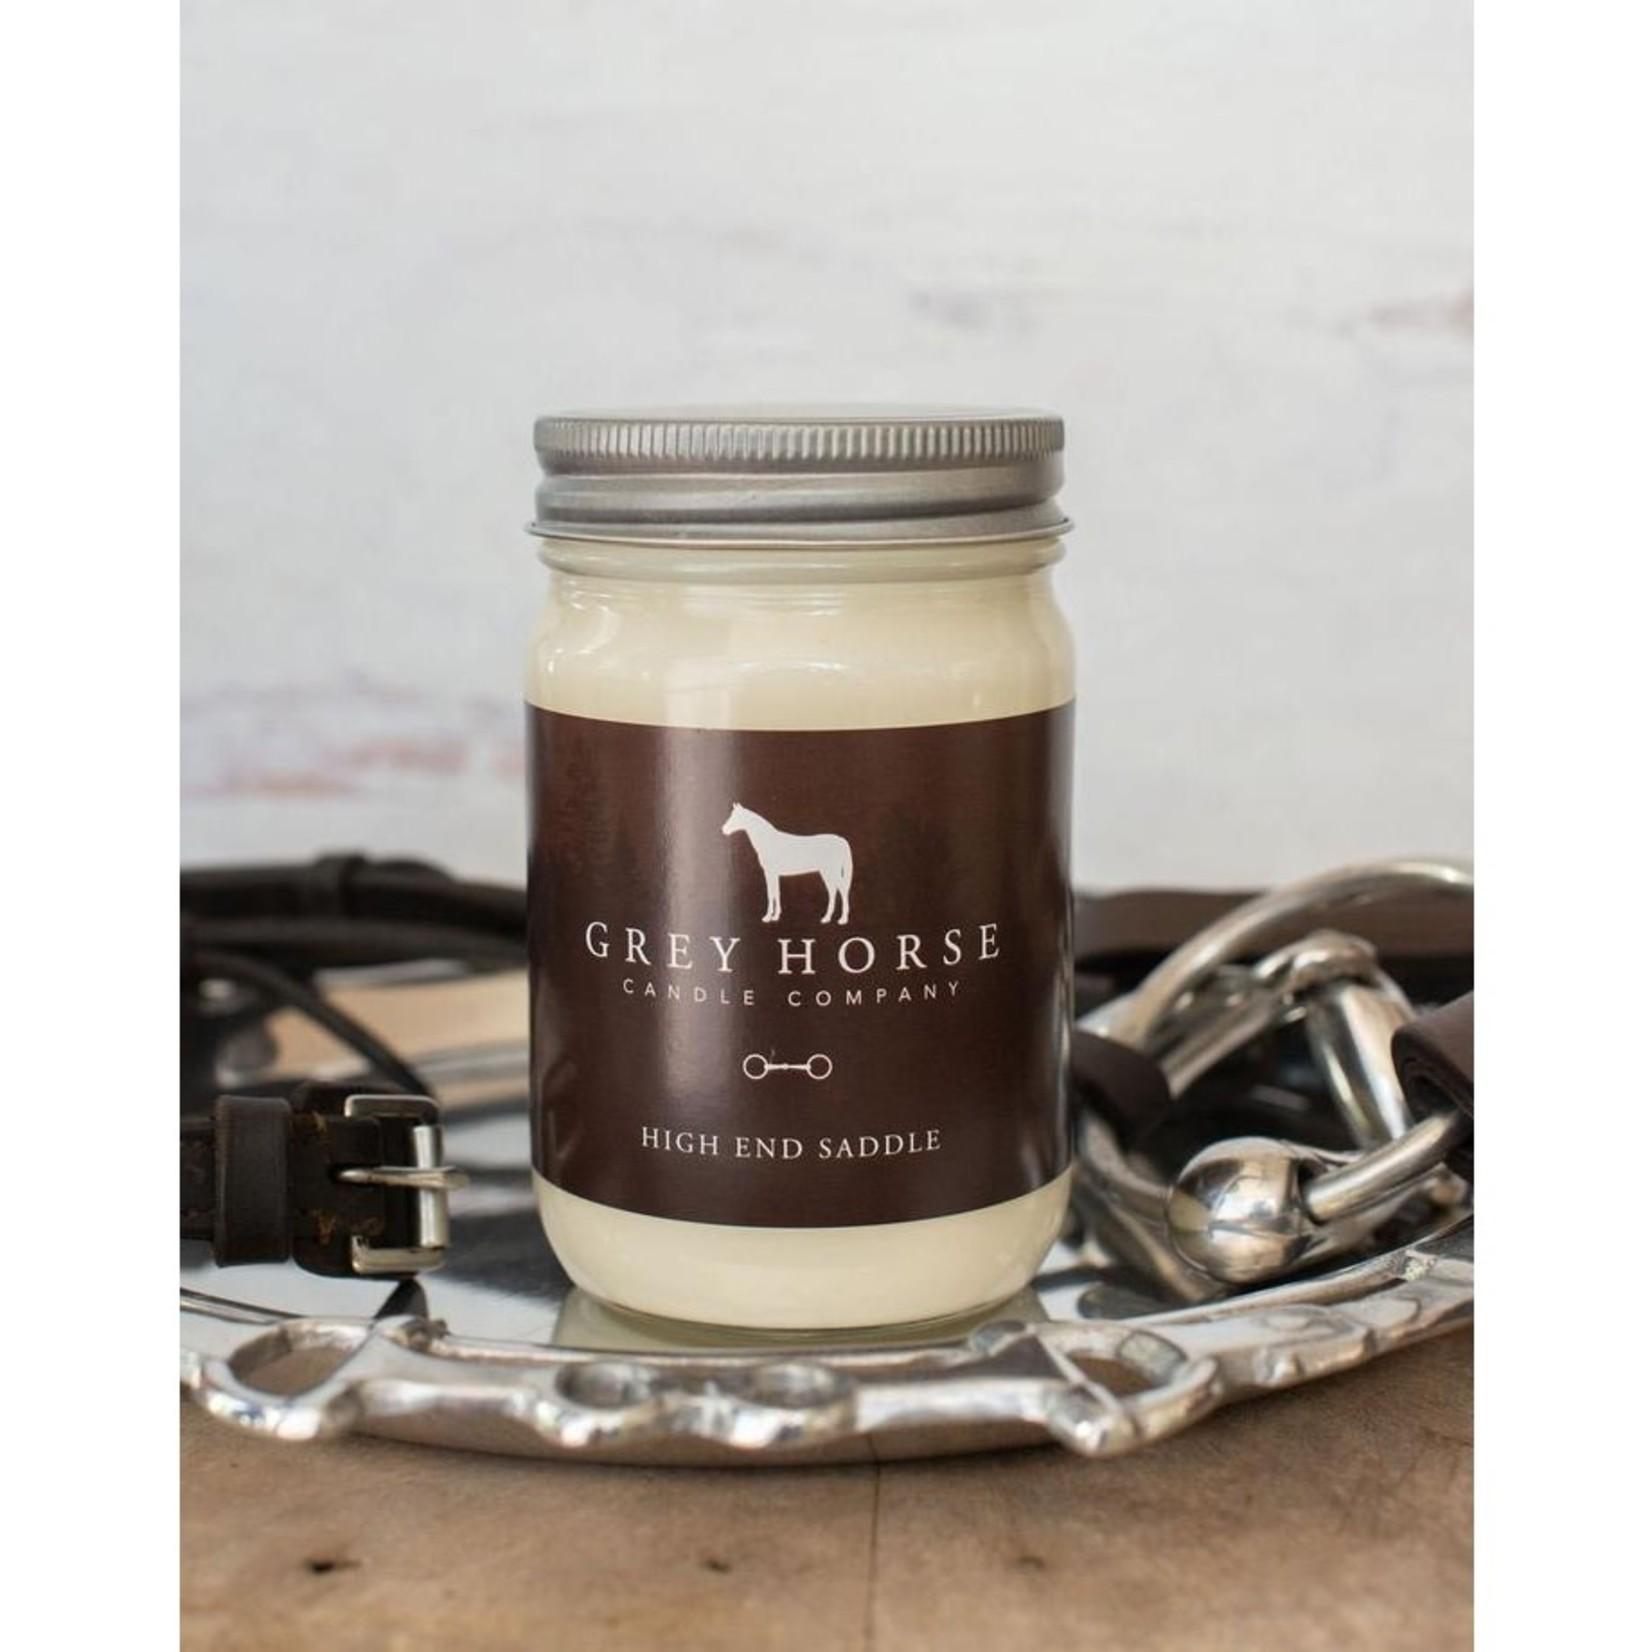 Grey Horse Candles Grey Horse Candle - High End Saddle 12oz